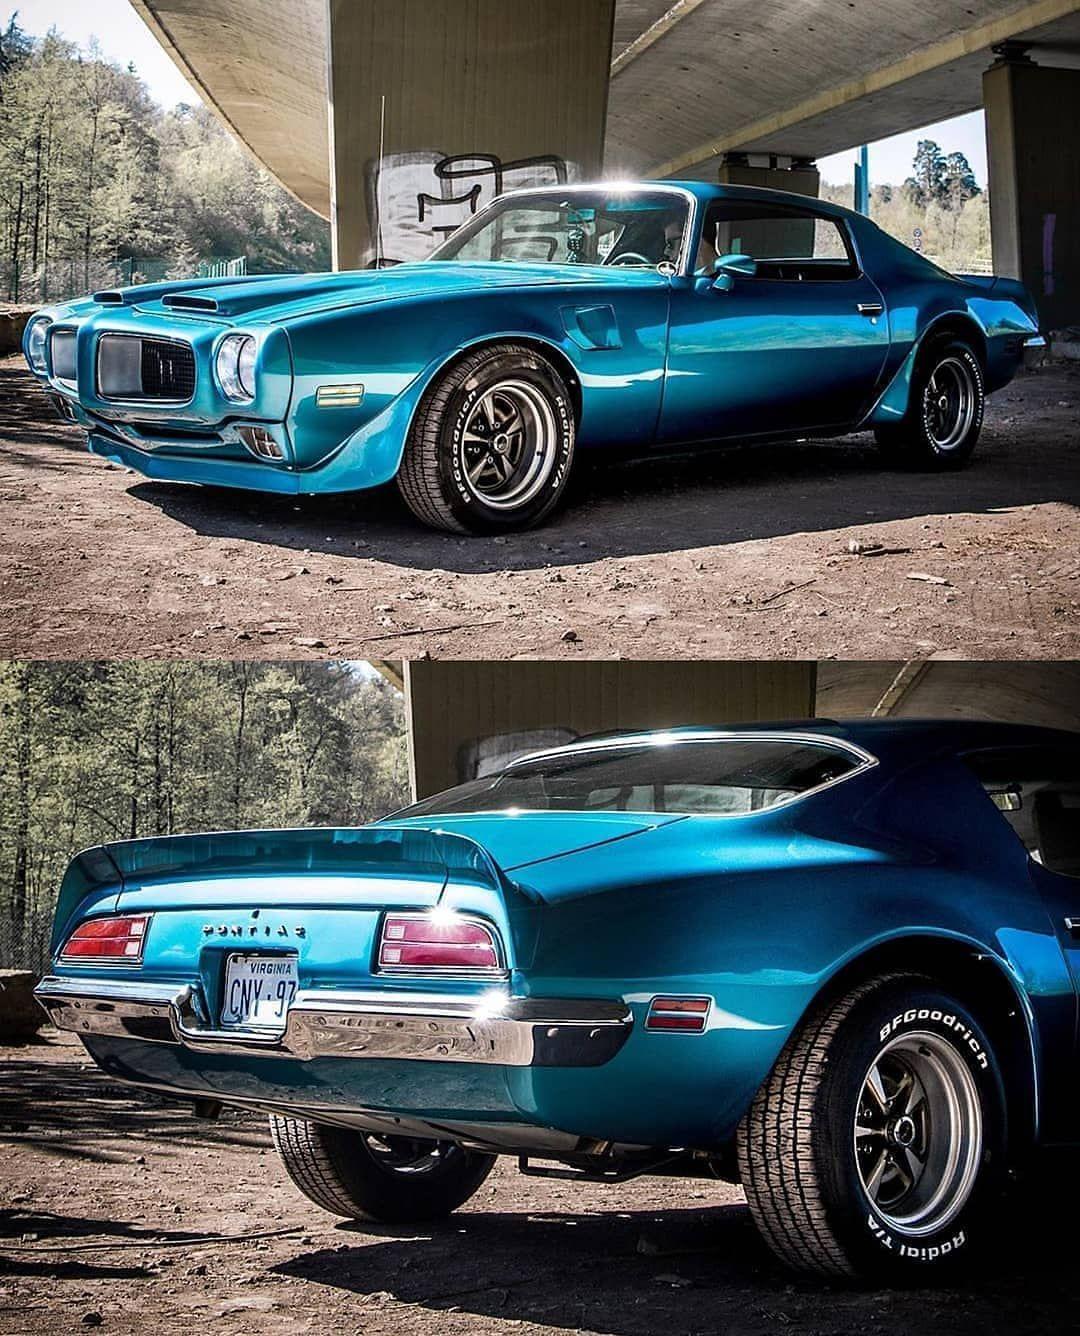 "Classic Cars Culture on Instagram: ""Pontiac Firebird Formula 400 Photos @pixeleye #pontiac #firebird #ClassicCarsCulture ••• #Classic #classics #Classiccar #classiccars…"""